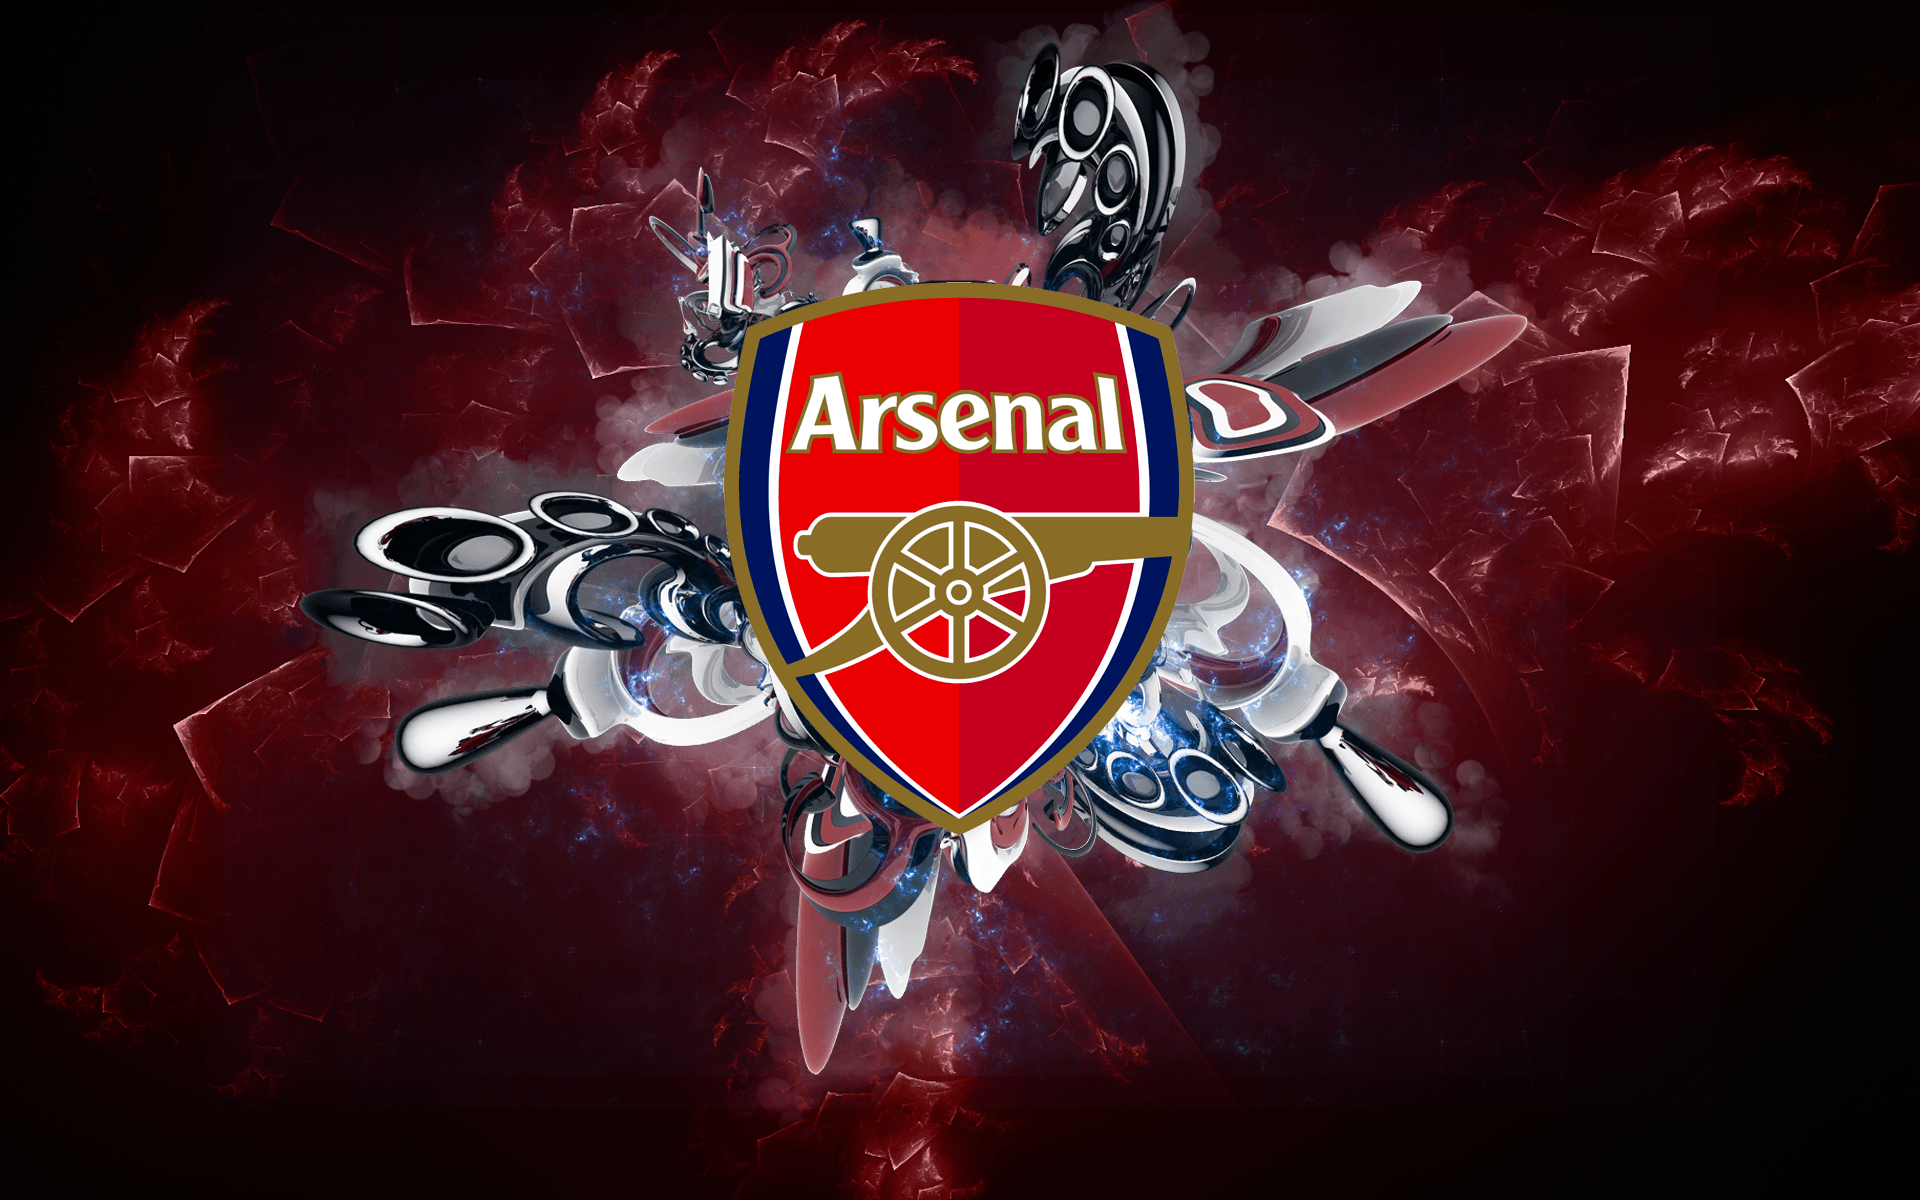 arsenal logo wallpapers 2016 wallpaper cave